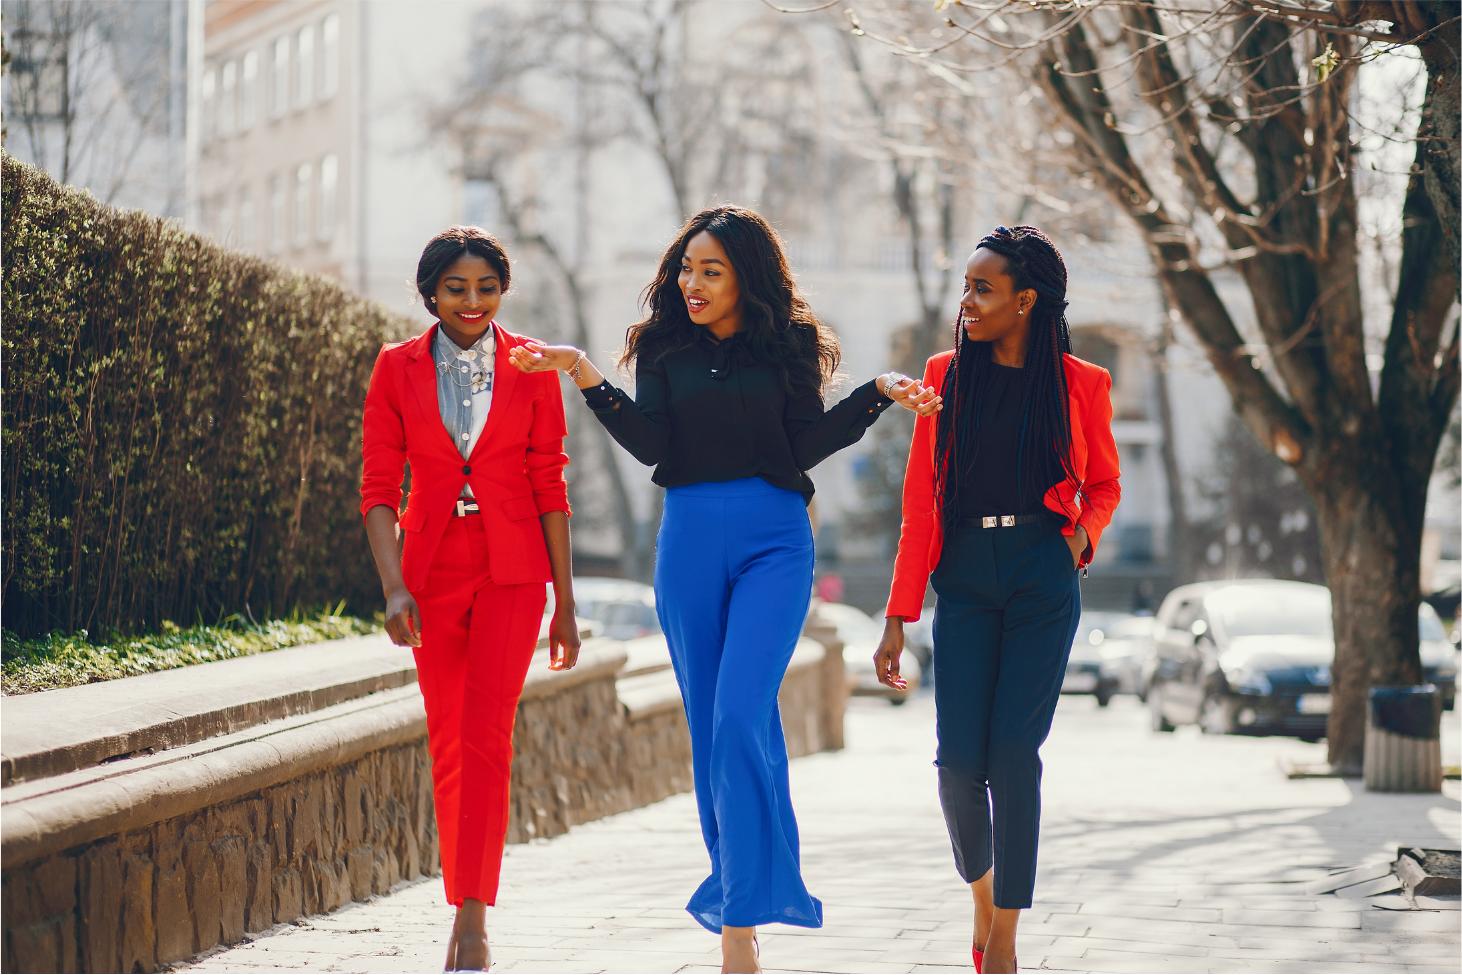 3 Professional black women walking down the street.